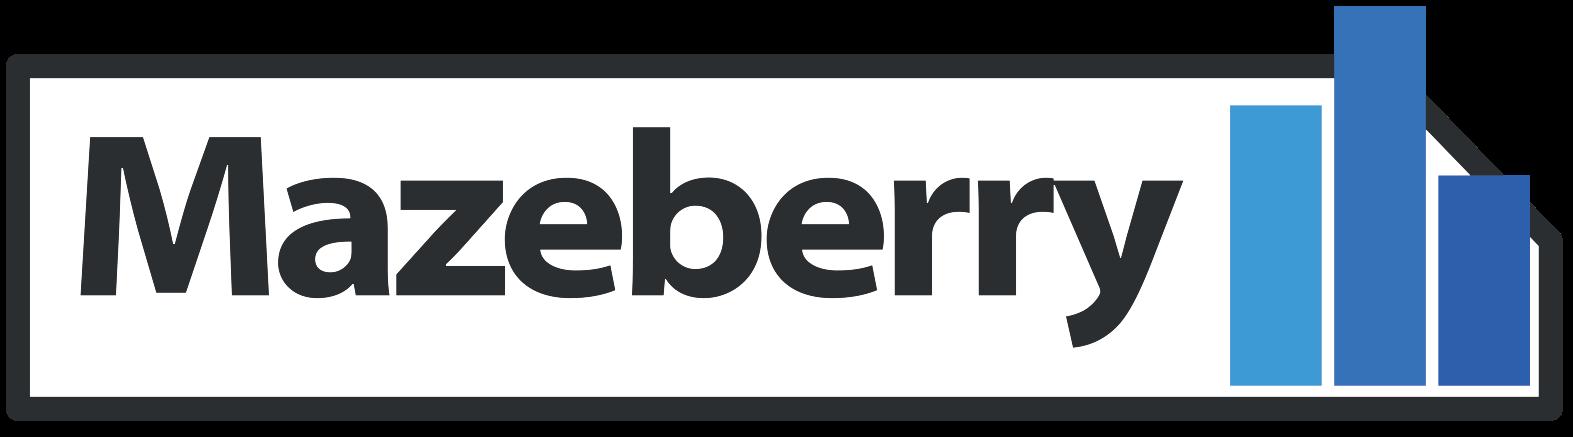 Mazeberry